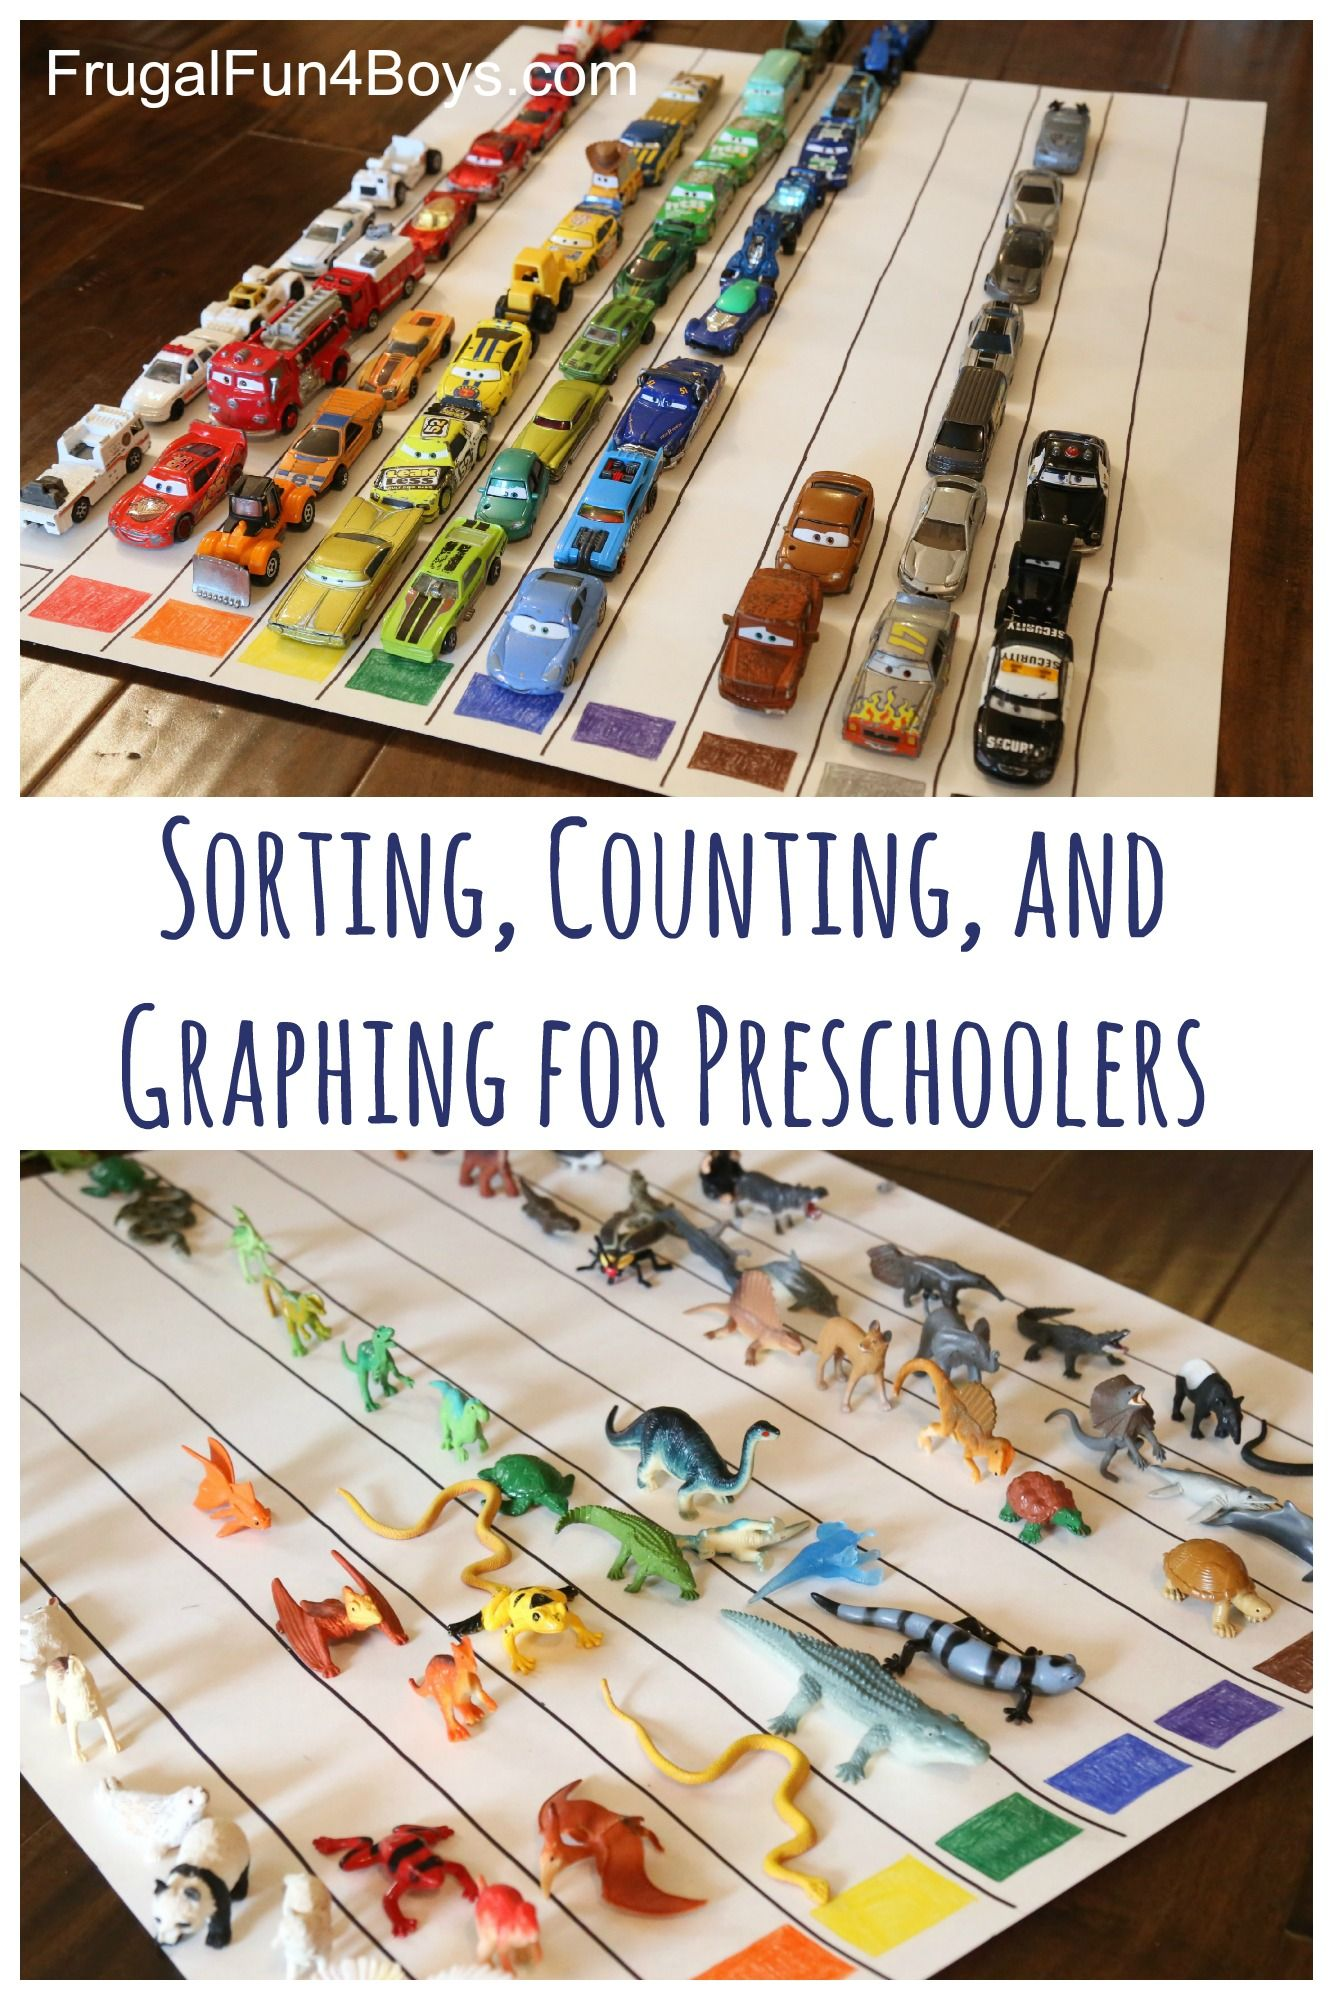 Sorting Counting And Graphing For Preschoolers Frugal Fun For Boys And Girls Preschool Preschool Activity Preschool Activities [ 2000 x 1333 Pixel ]